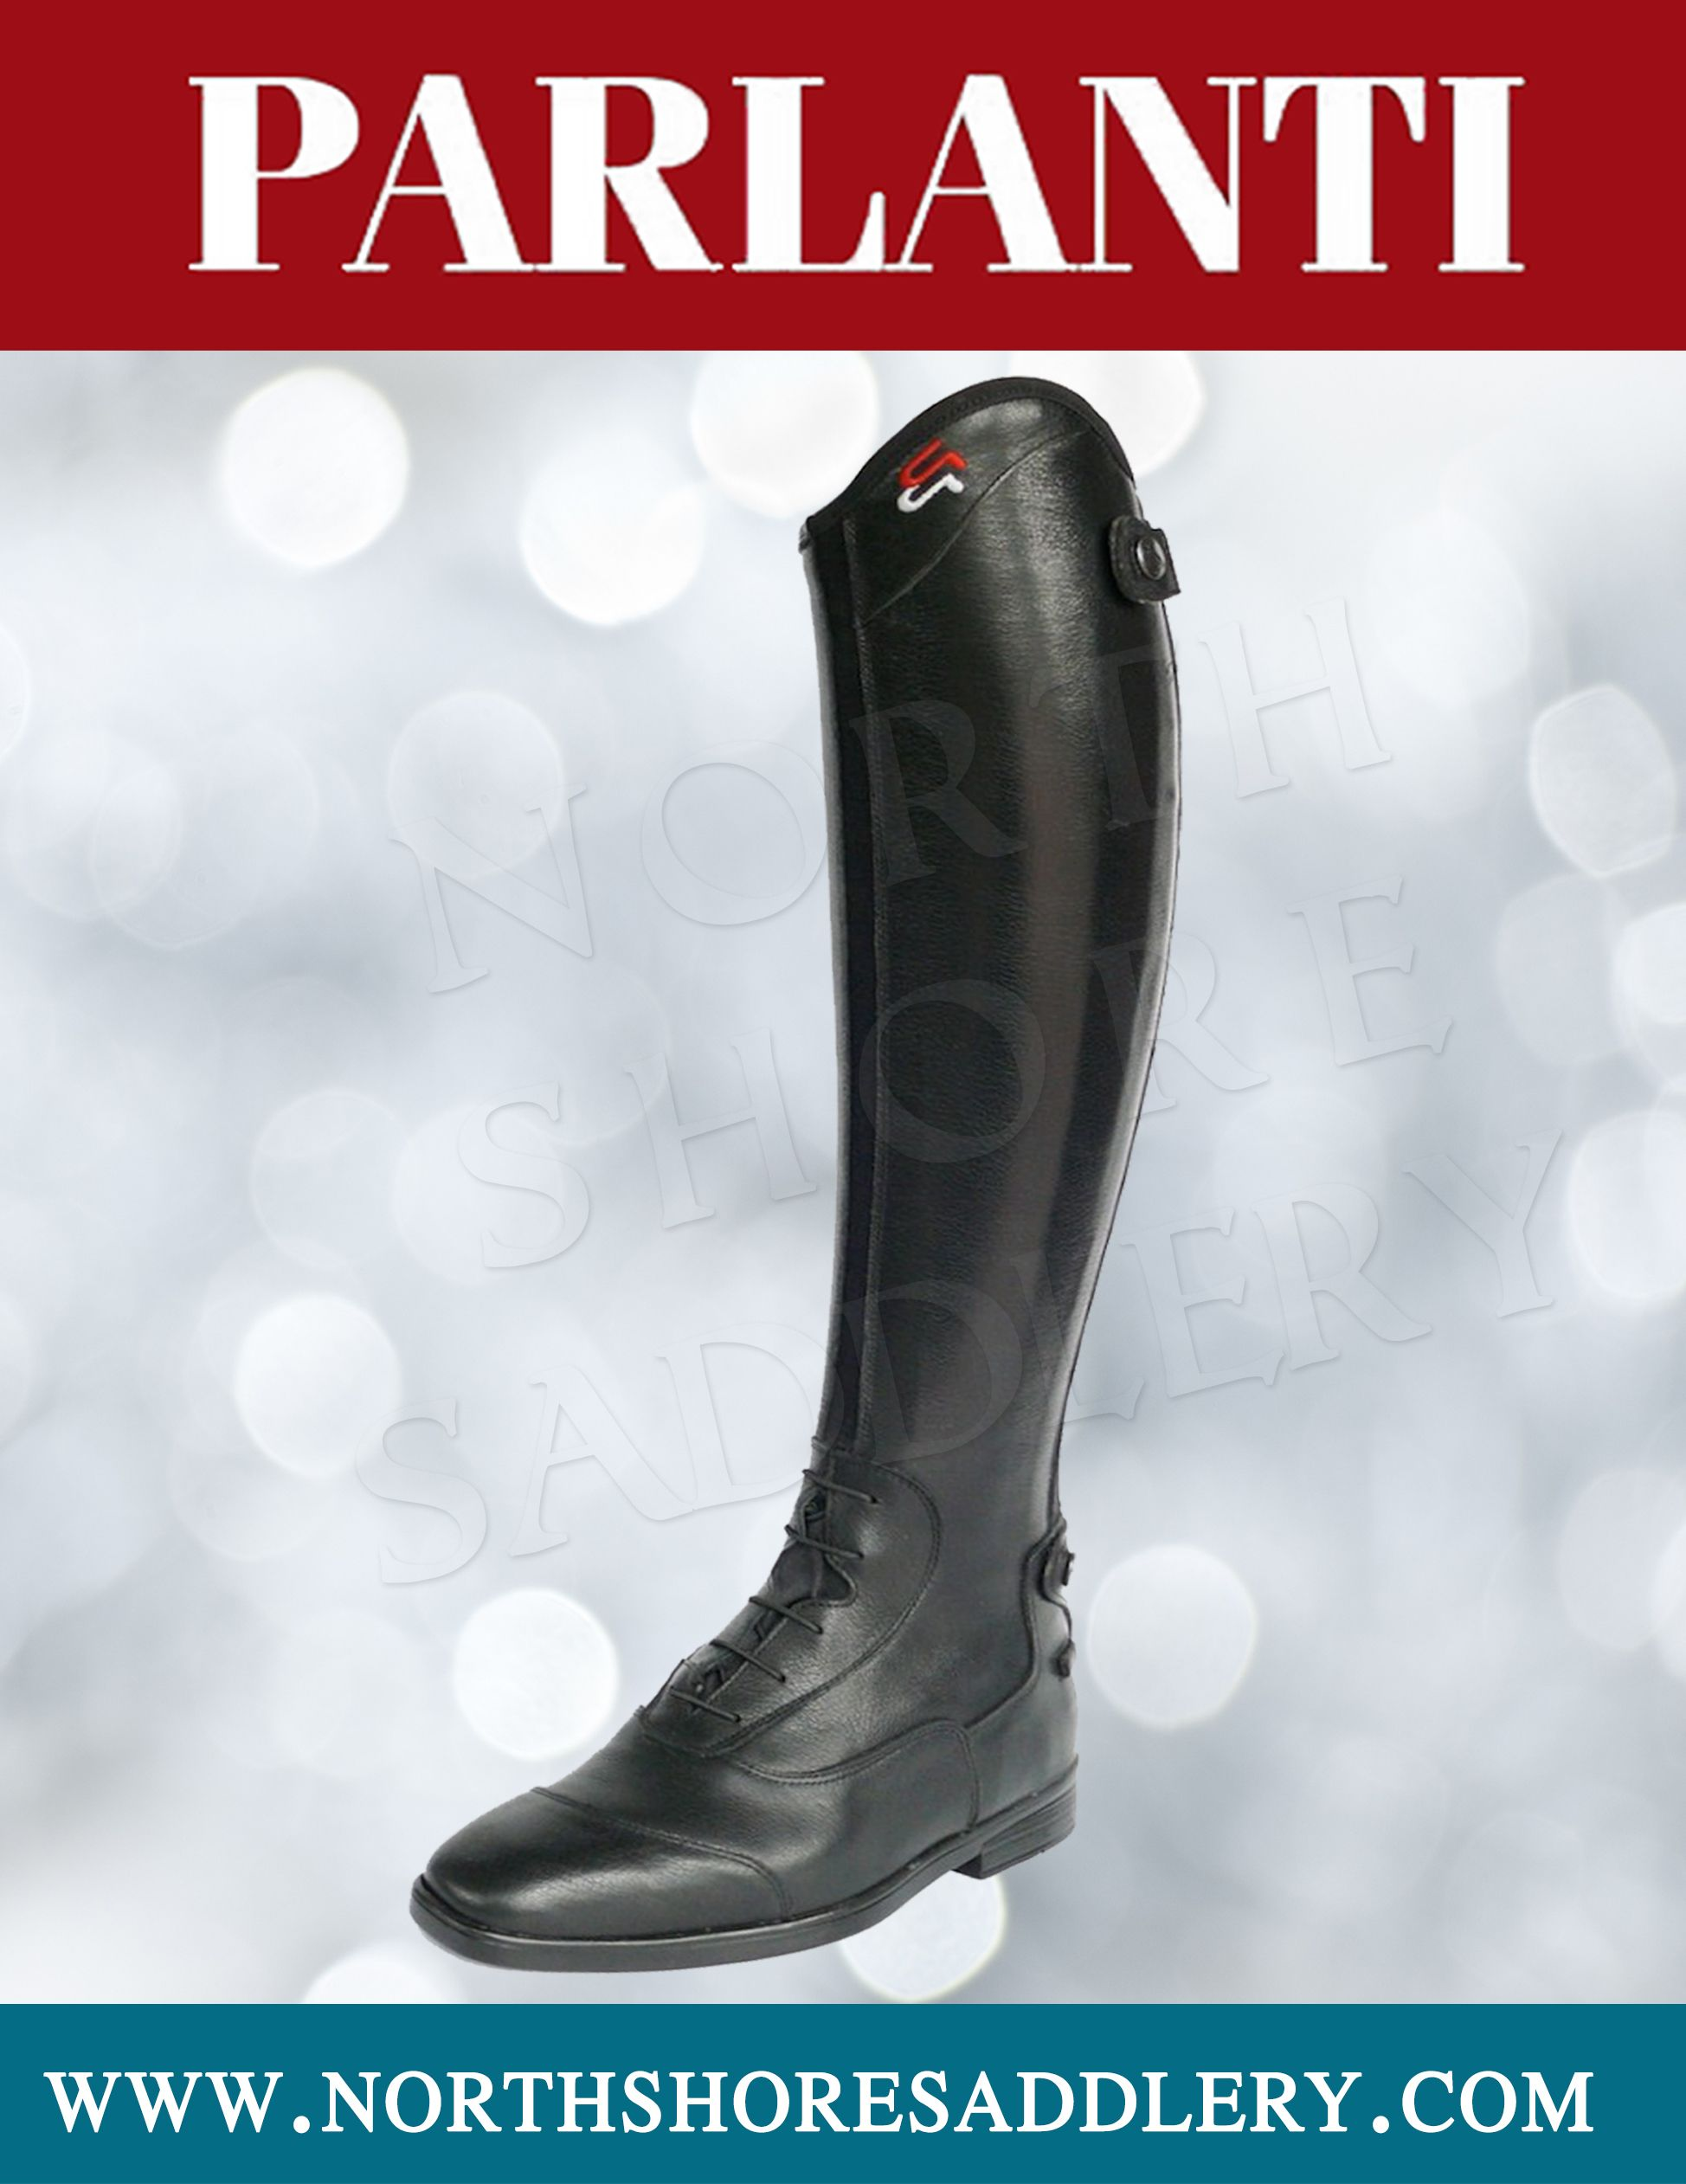 Parlanti Ocala Riding Boots! Innovative